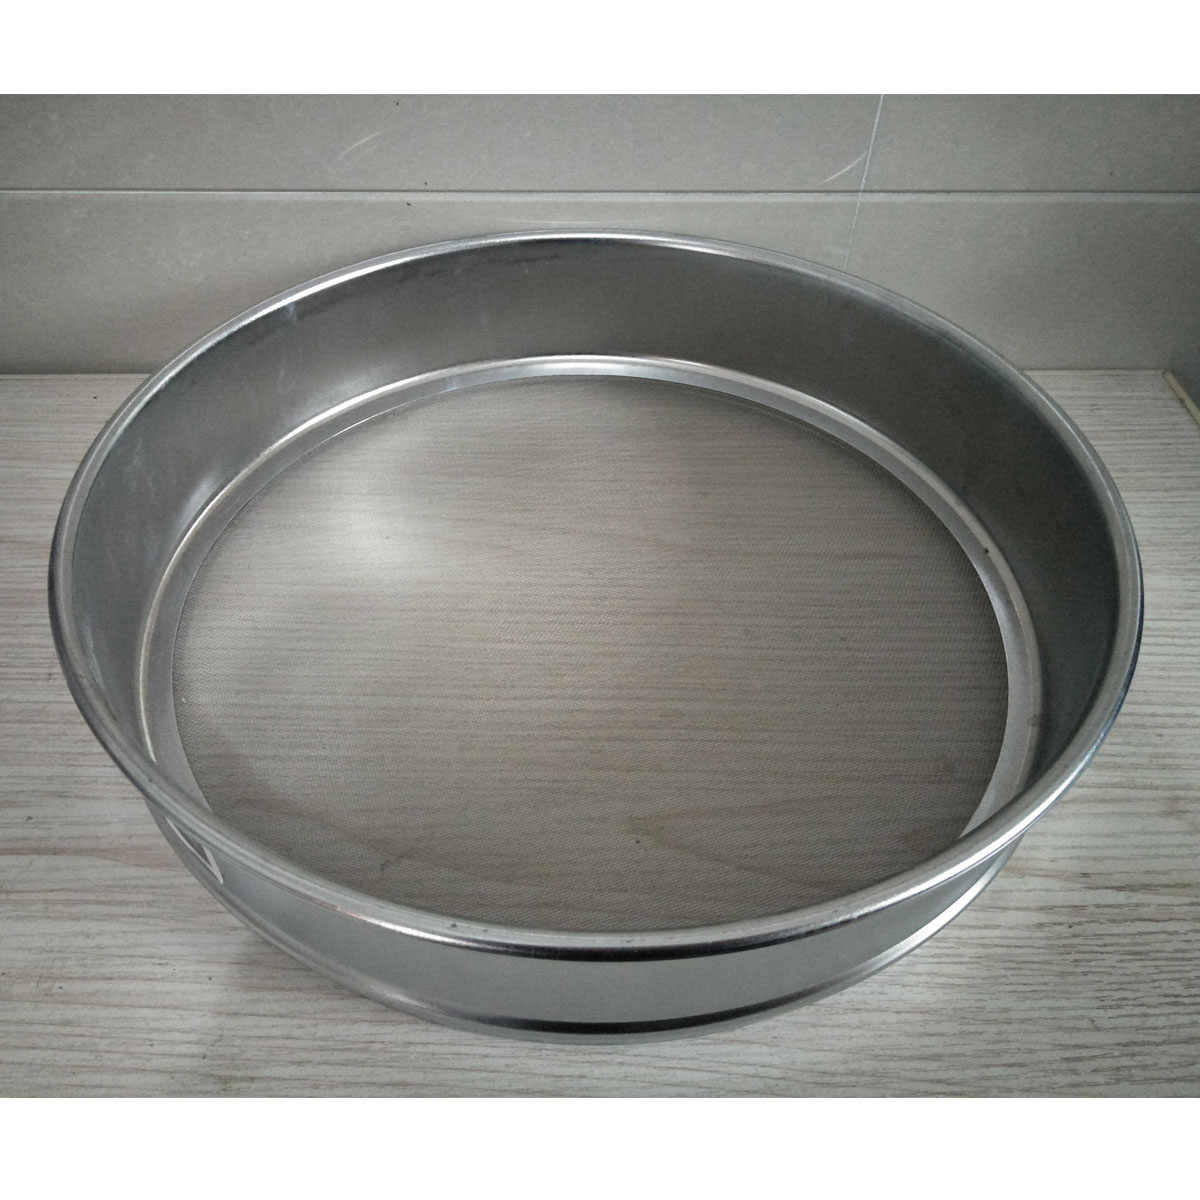 UK 4-100 Mesh 4.75-0.15mm Aperture Lab Standard Test Sieve Stainless Steel Dia